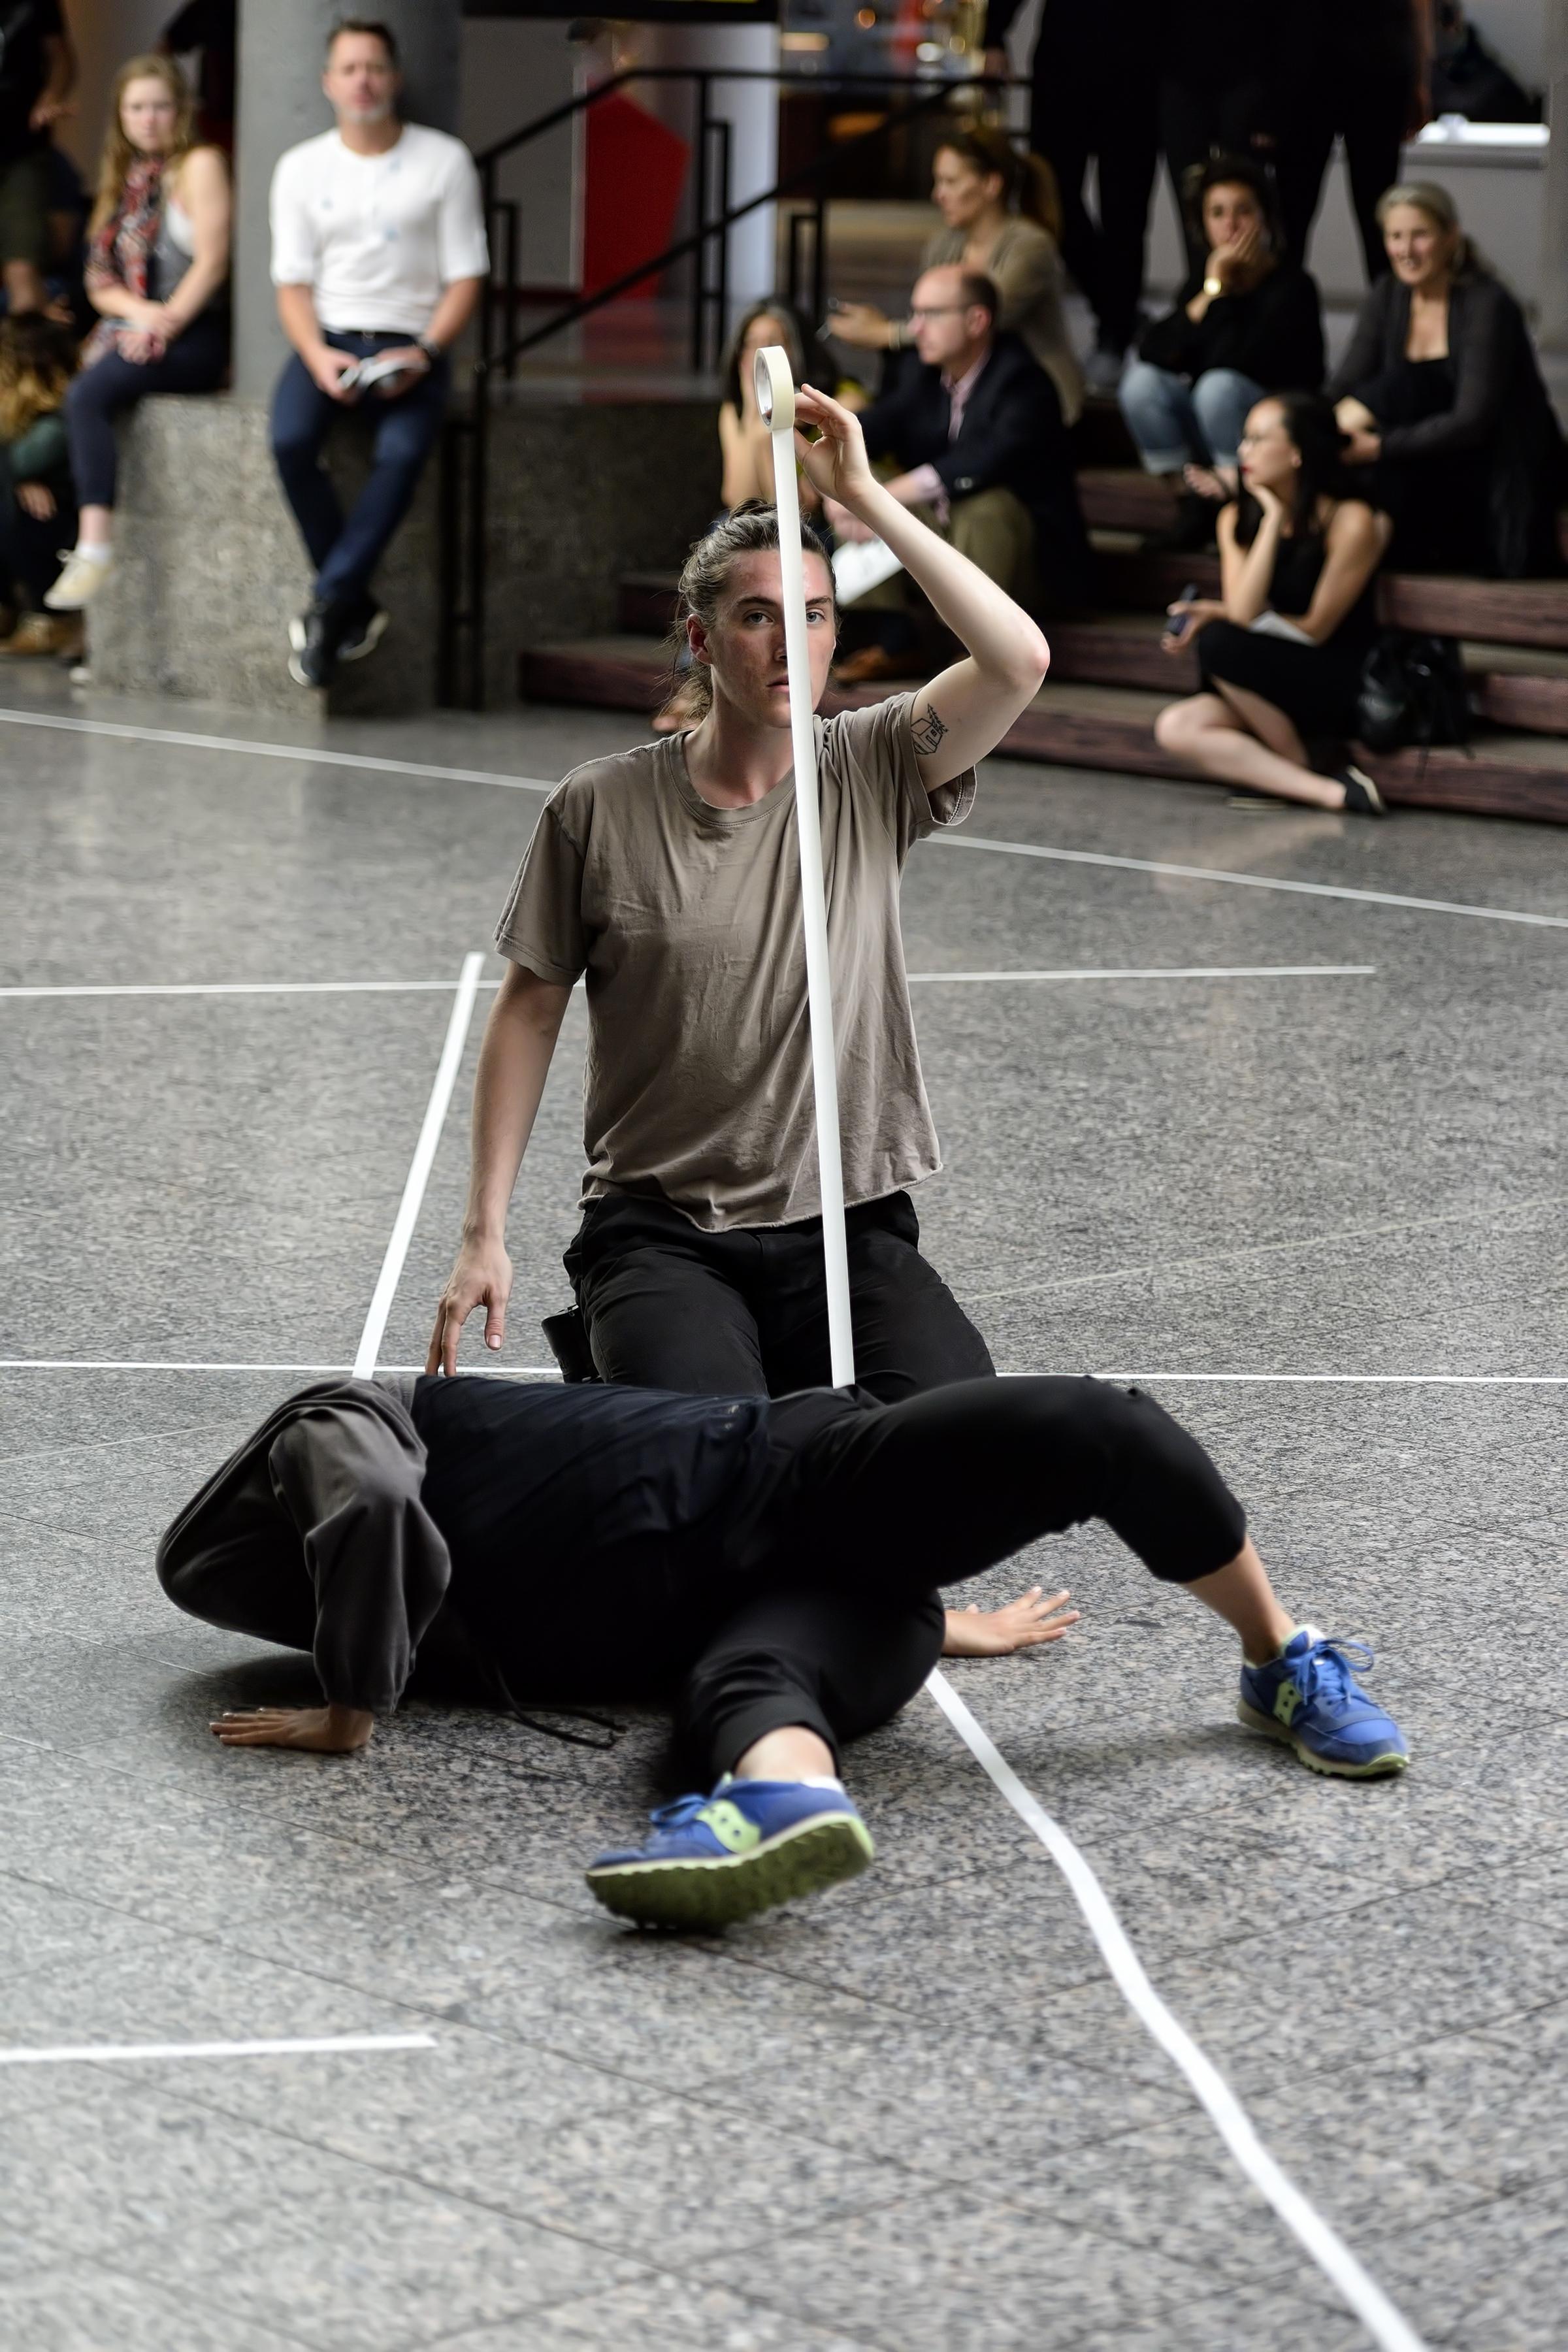 2016 Emerging Choreographer Spenser Theberge_Installation_01